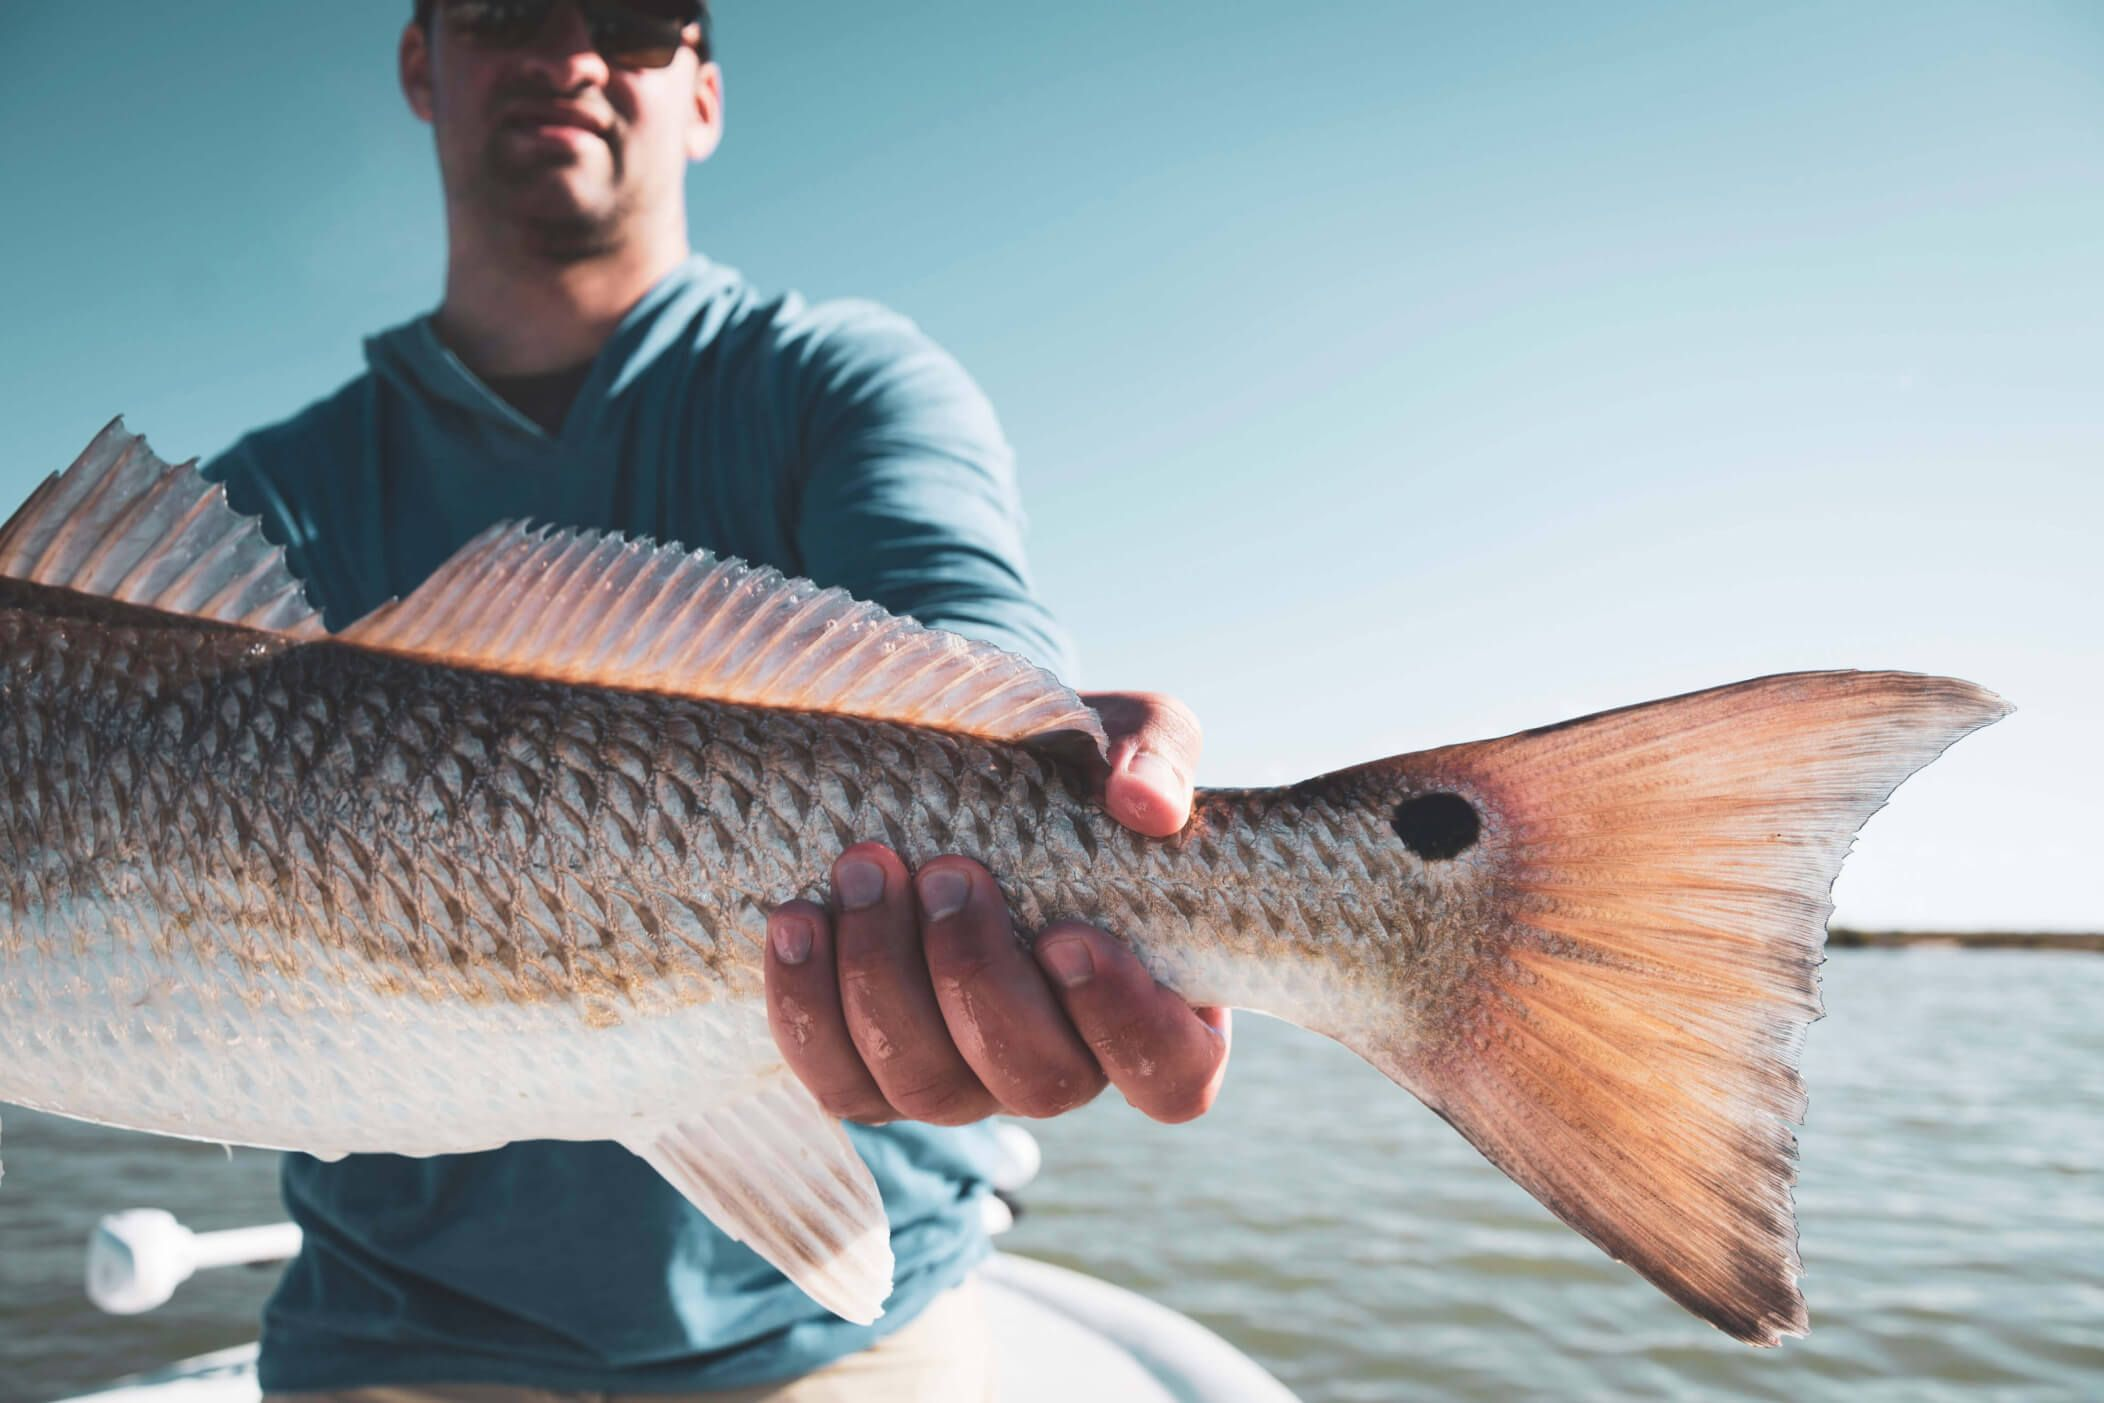 Galveston Tx Luxury Fishing Charters Guided Group Fishing Trips Captain Experiences Fishing Charters Fish Fishing Trip